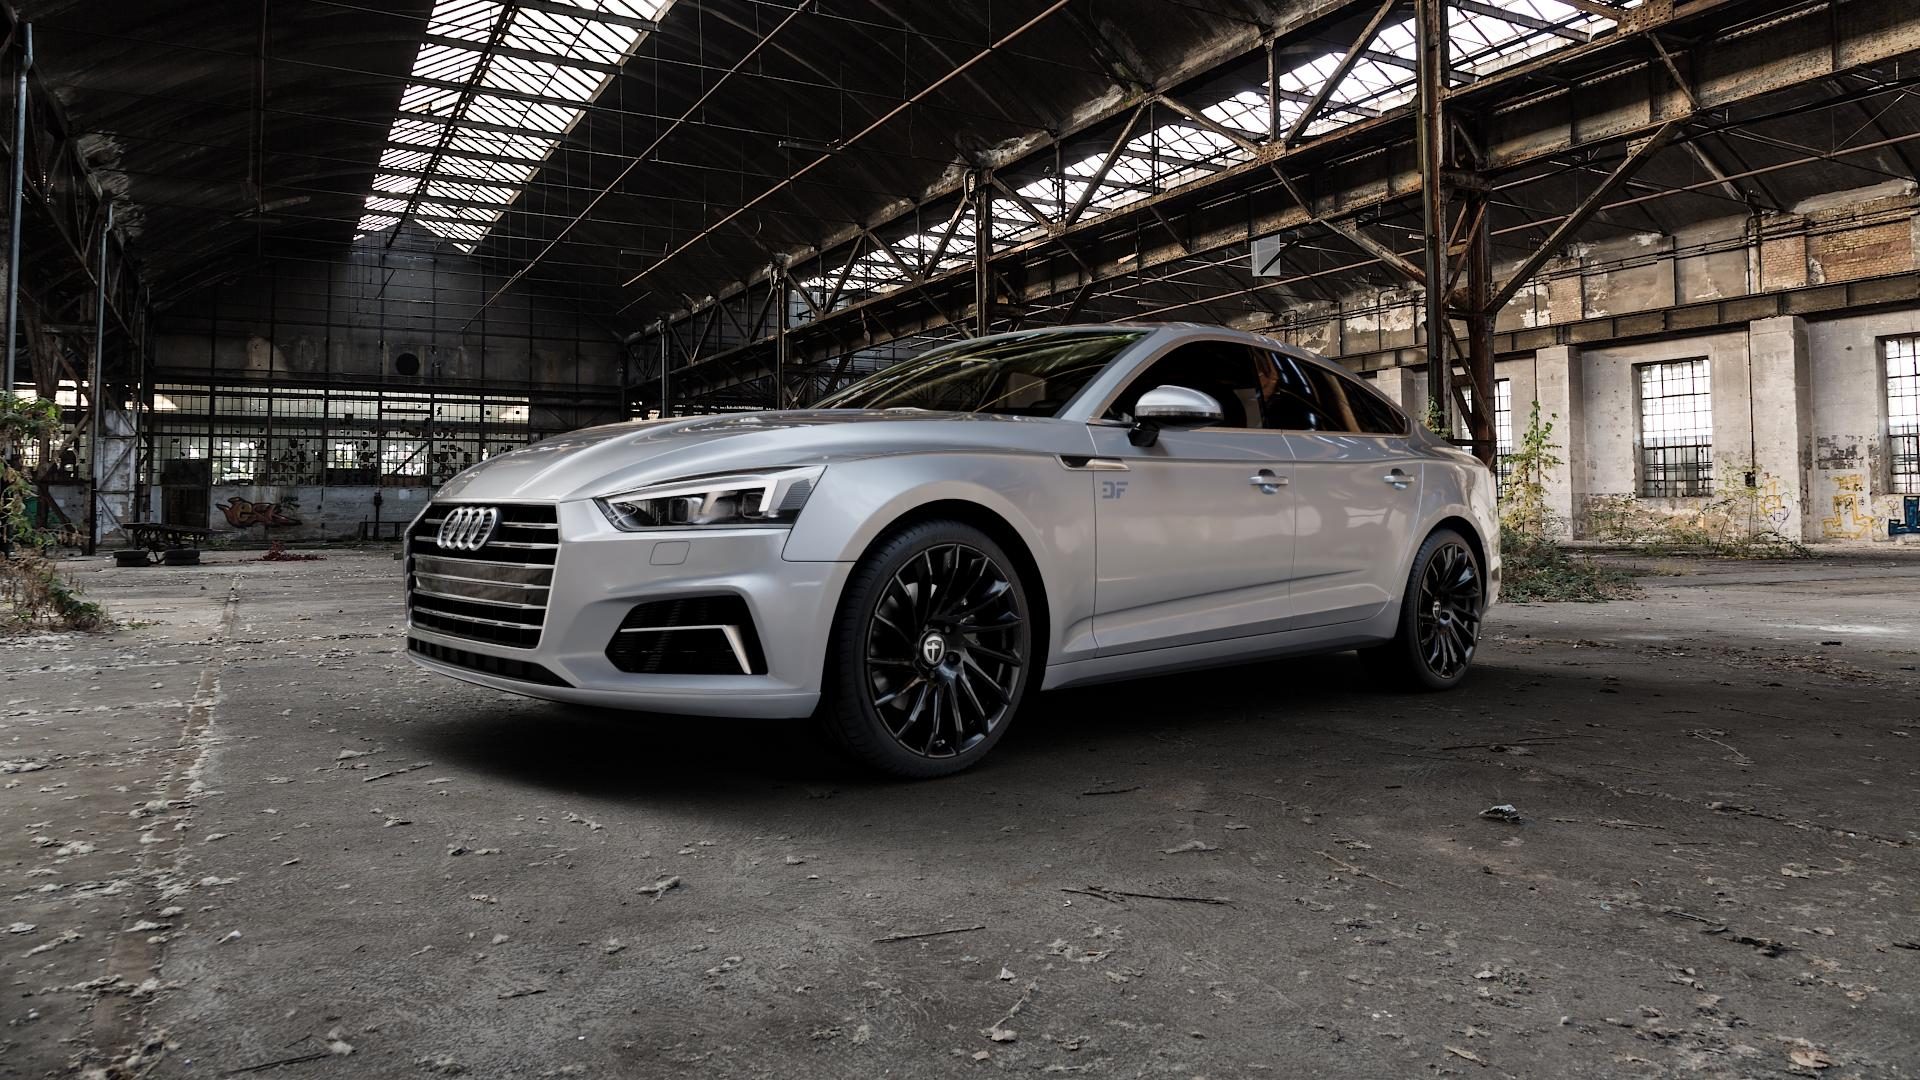 TOMASON TN16 Black painted Felge mit Reifen schwarz in 19Zoll Winterfelge Alufelge auf silbernem Audi A5 Typ B9 (Sportback) 2,0l TDI 140kW (190 PS) quattro TFSI 185kW (252 3,0l 160kW (218 200kW (272 1,4l 110kW (150 183kW (249 g-tron 125kW (170 Mild-Hybrid 100kW (136 210kW (286 45 180kW (245 35 40 50 170kW (231 120kW (163 30 ⬇️ mit 15mm